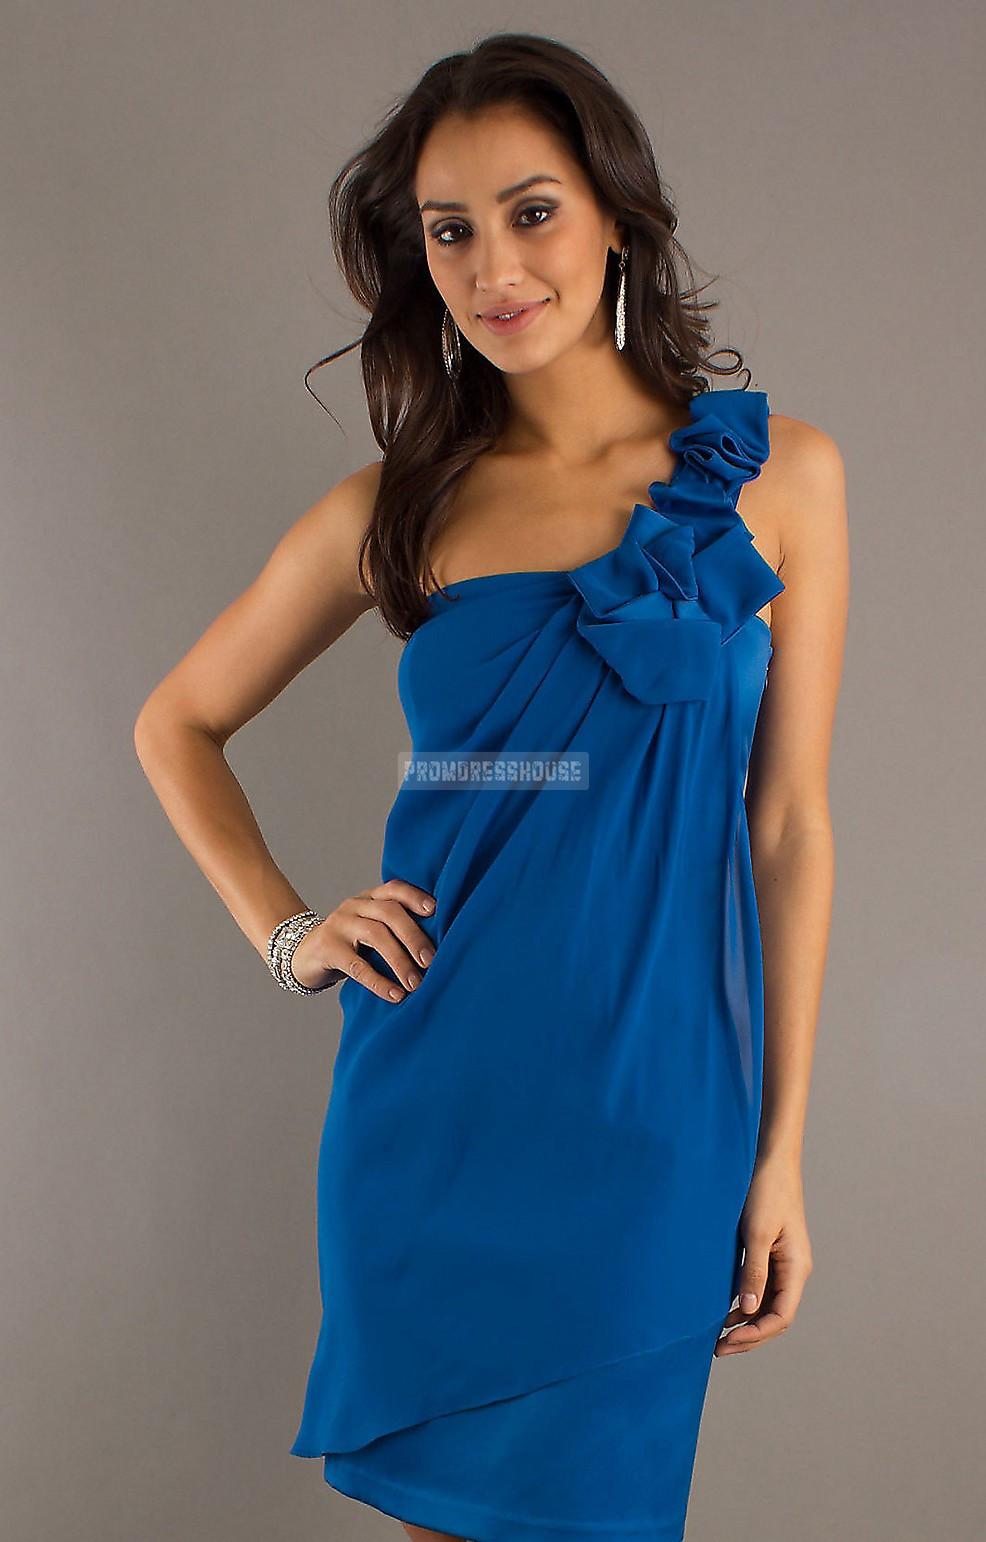 Short Length Blue One Shoulder Ruffles Chiffon Prom Dress - Promdresshouse.com